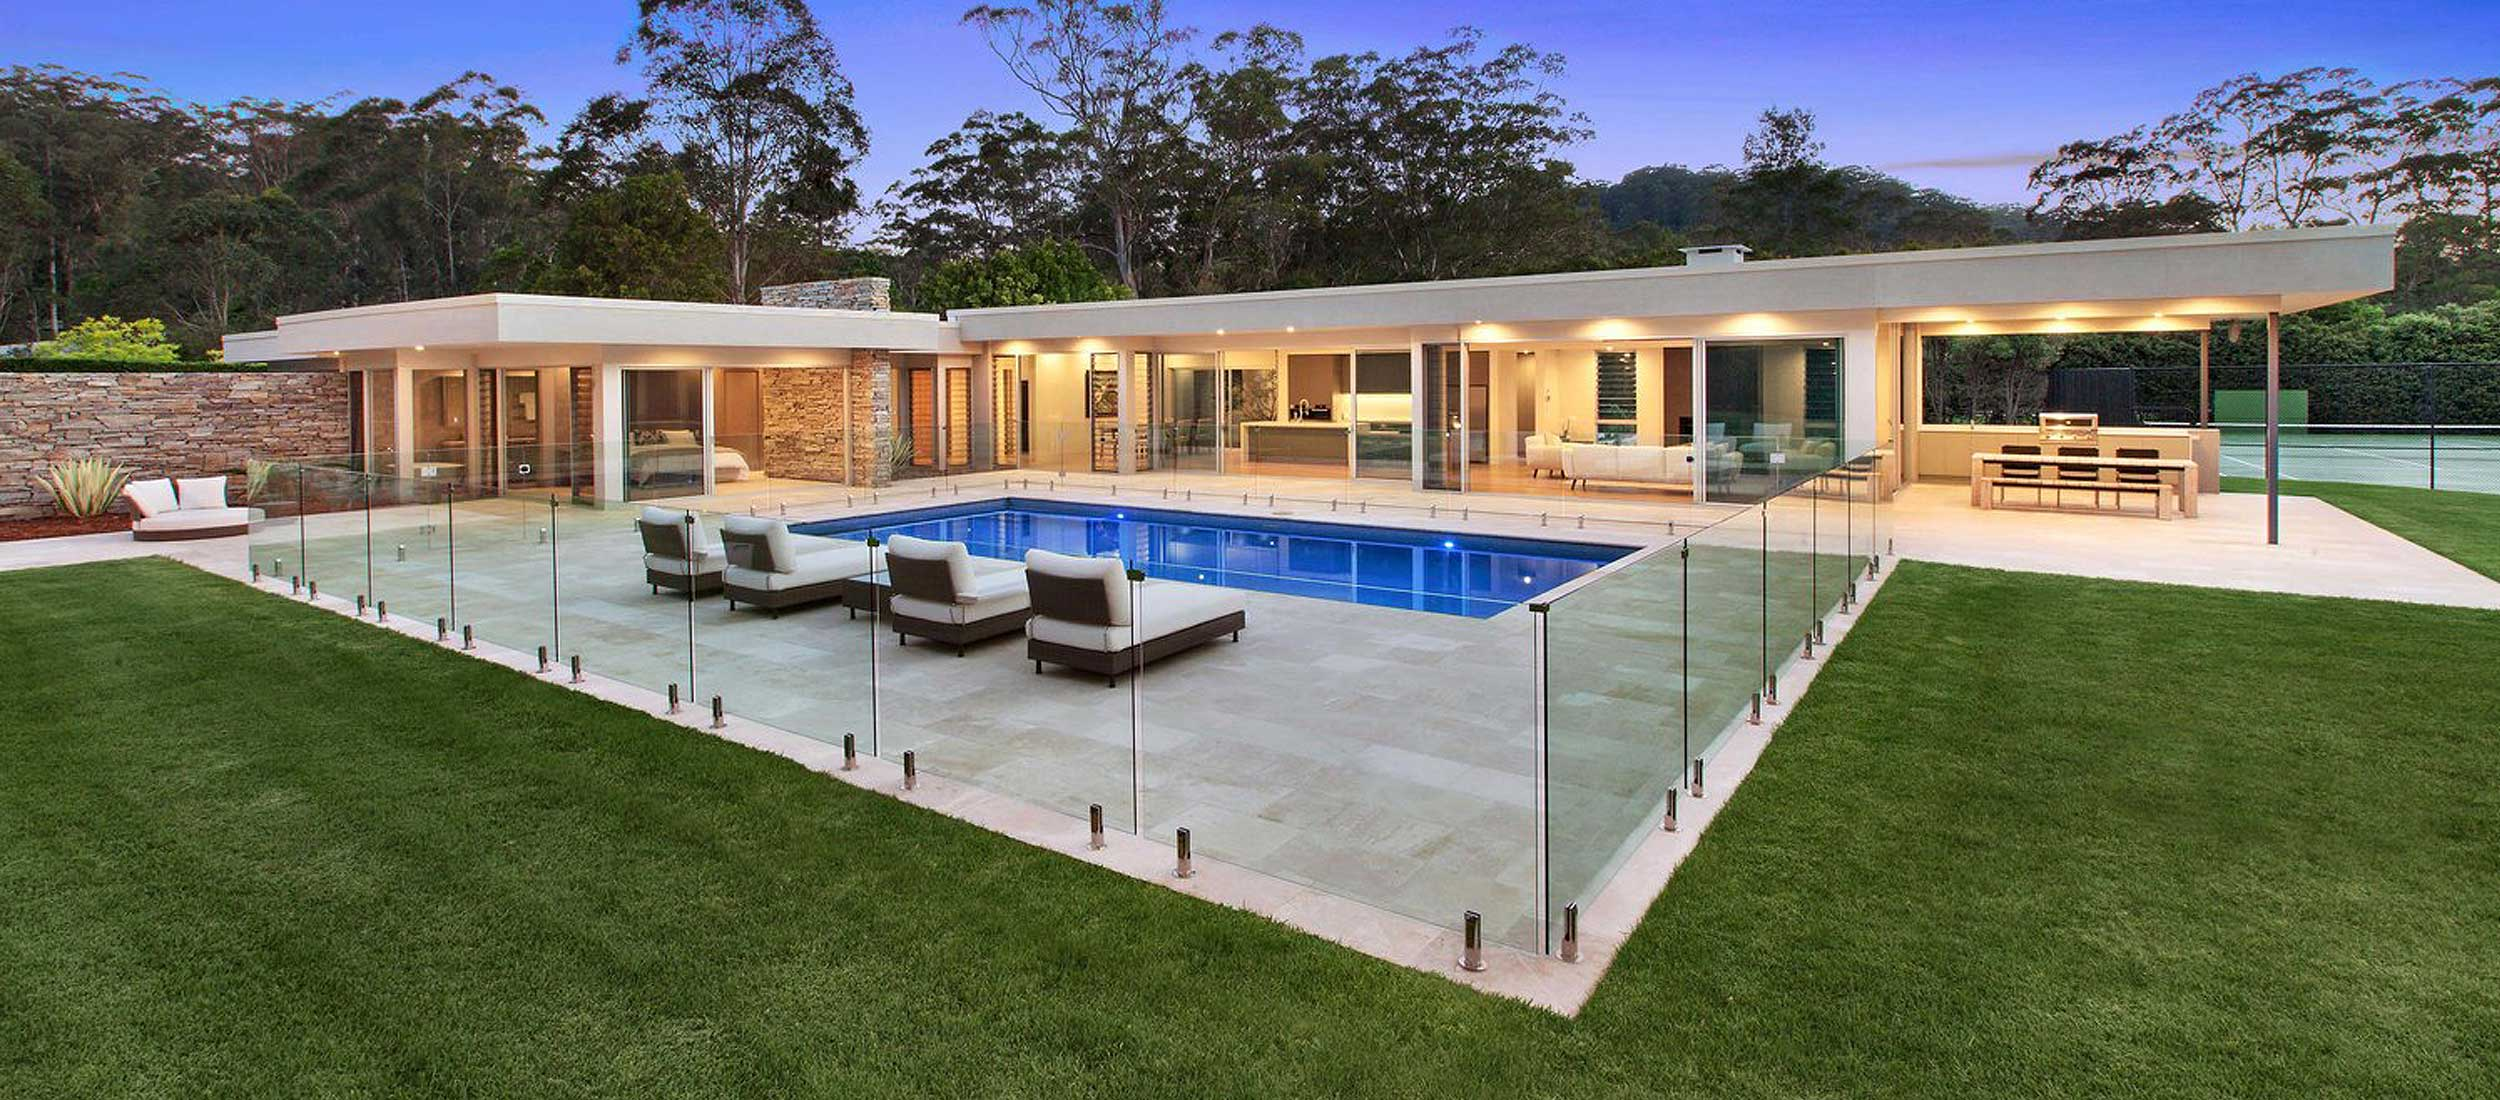 classic travertine pool